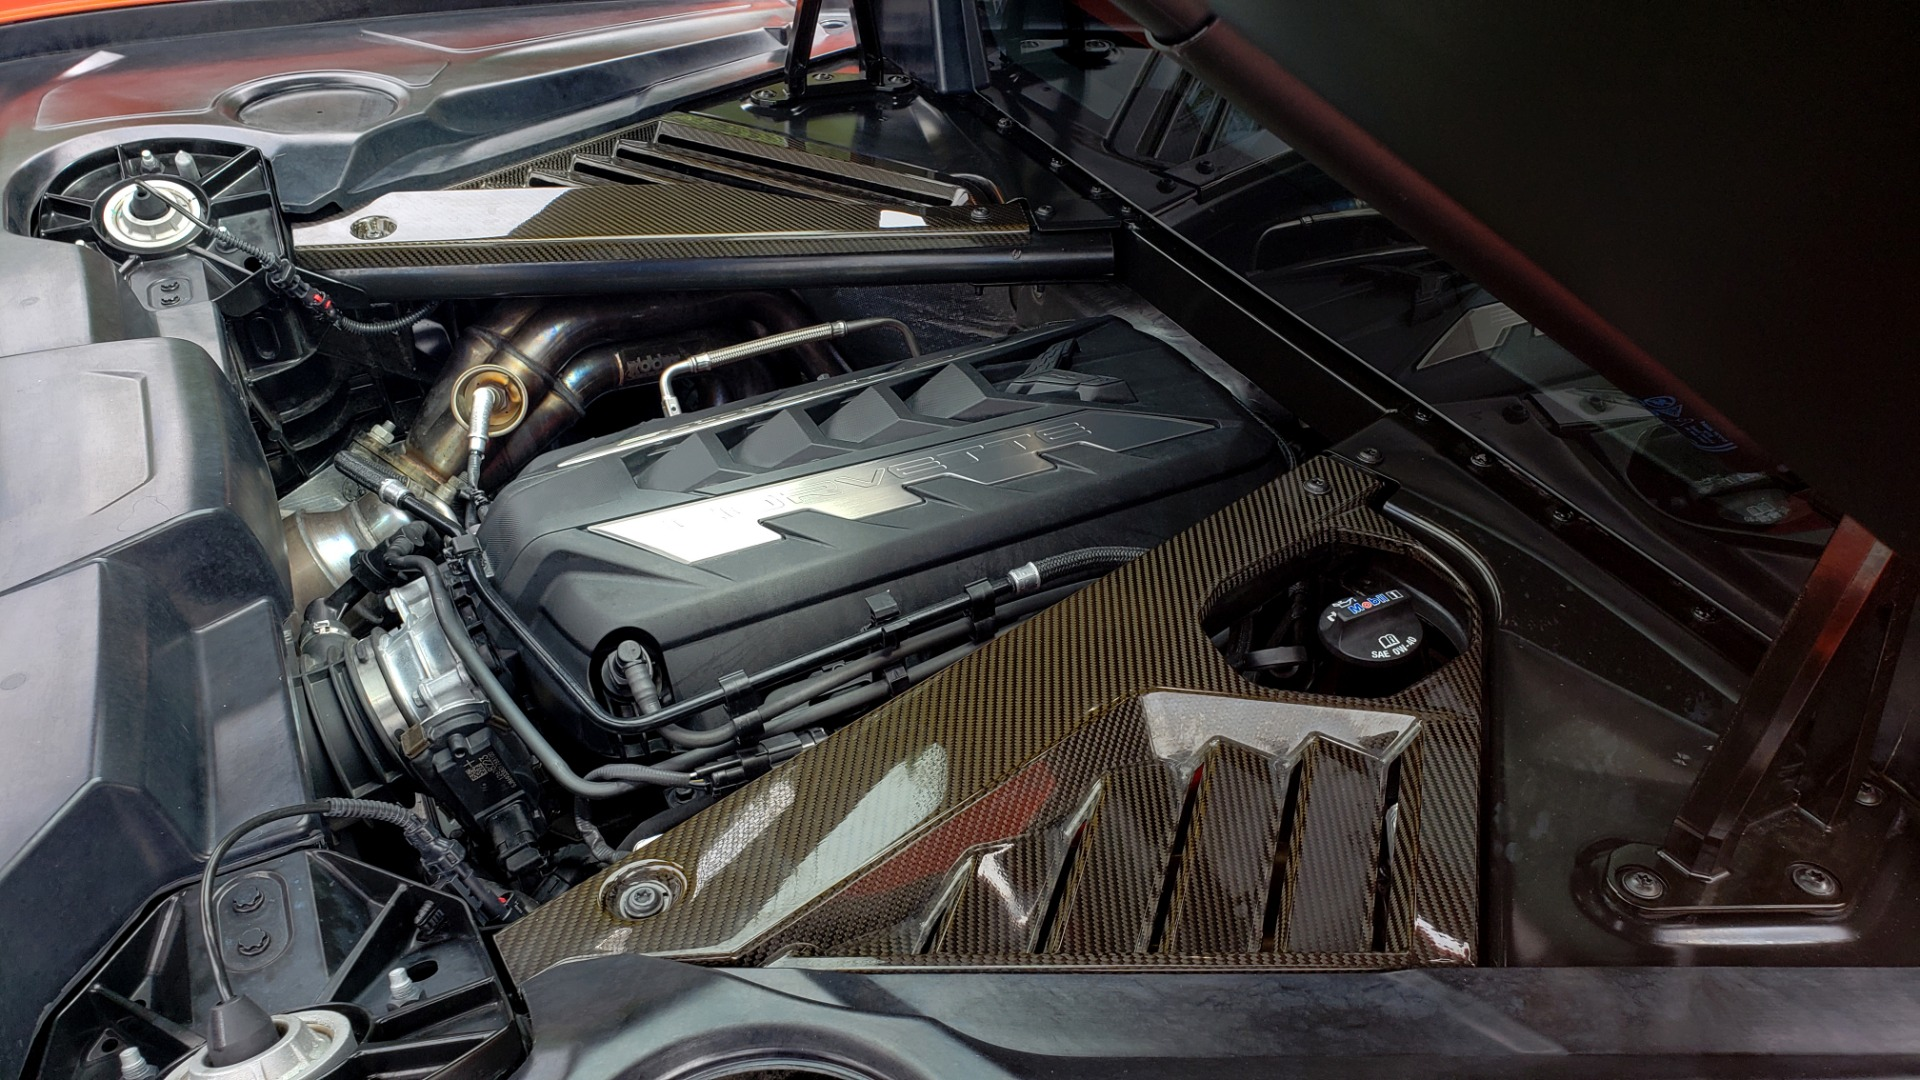 Used 2020 Chevrolet CORVETTE C8 STINGRAY 2LT / 6.2L V8 / 8-SPD AUTO / NAV / BOSE / REARVIEW / DATA RECOR for sale Sold at Formula Imports in Charlotte NC 28227 23